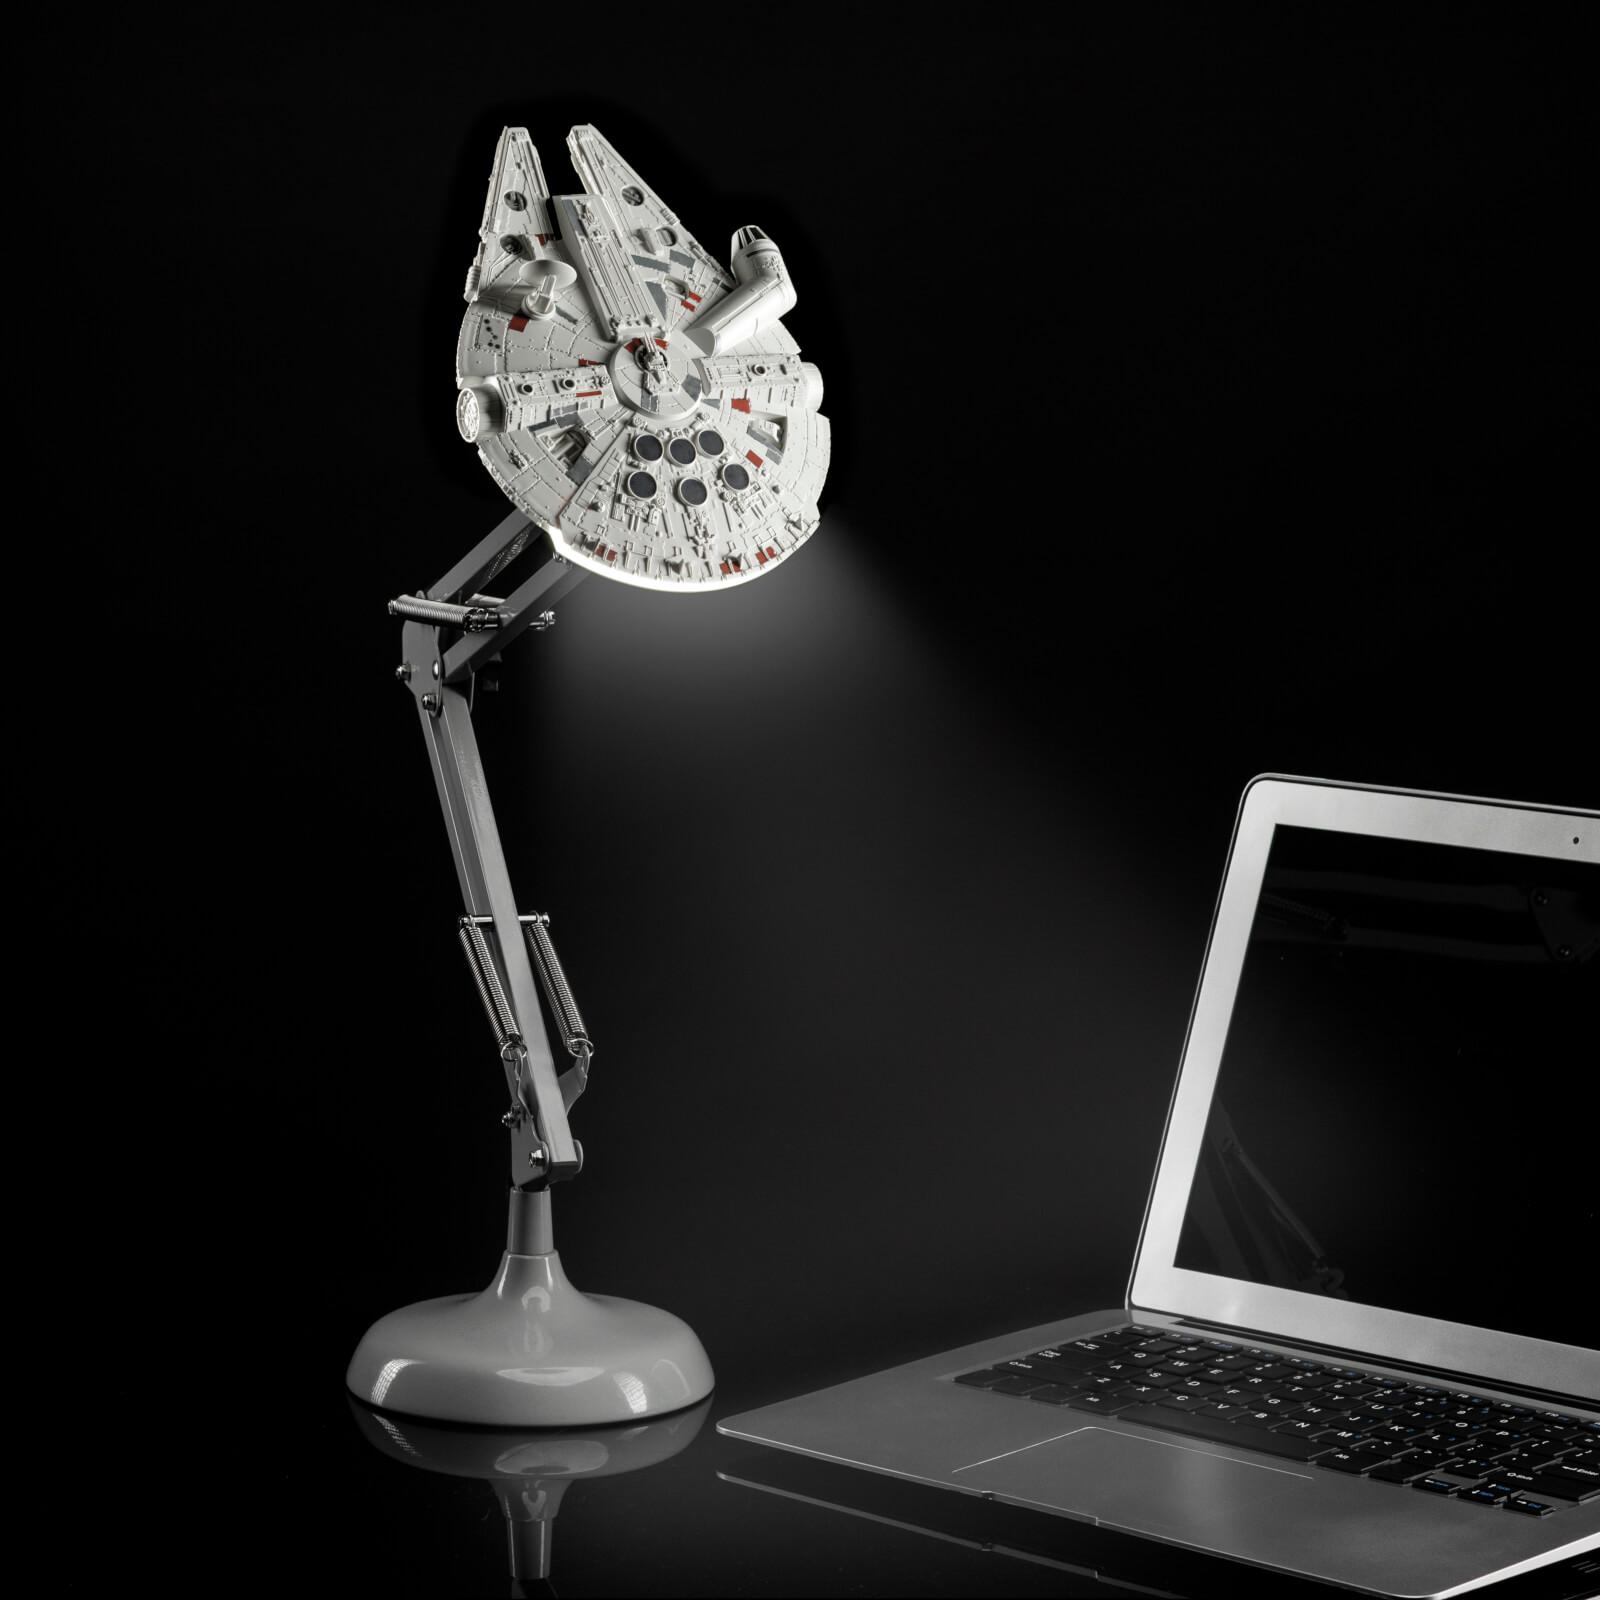 millenium falcon gift ideas star wars desk lamp